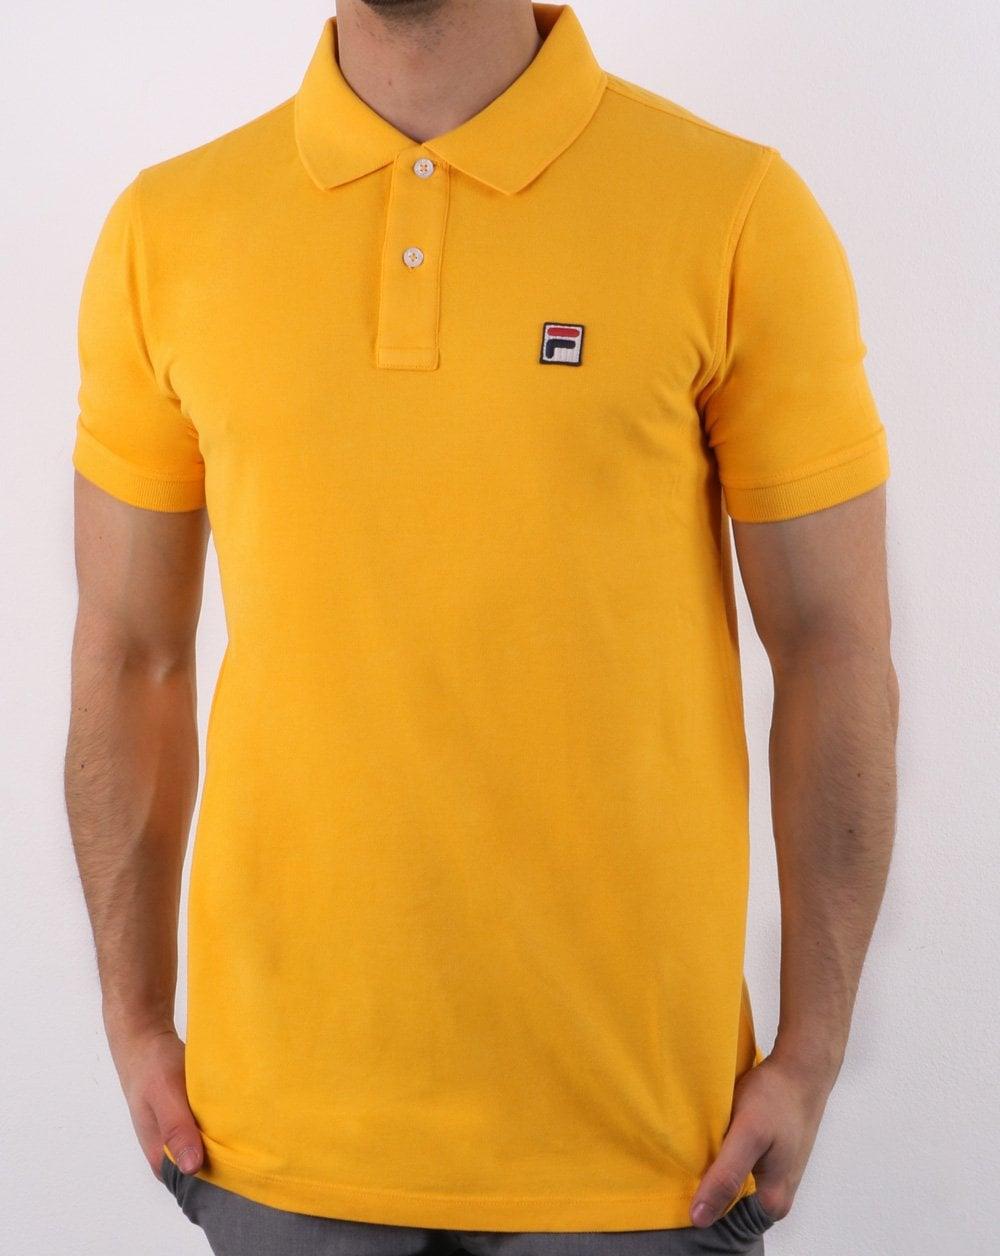 7ad0007b Fila Vintage Dante Polo Shirt Yellow Gold